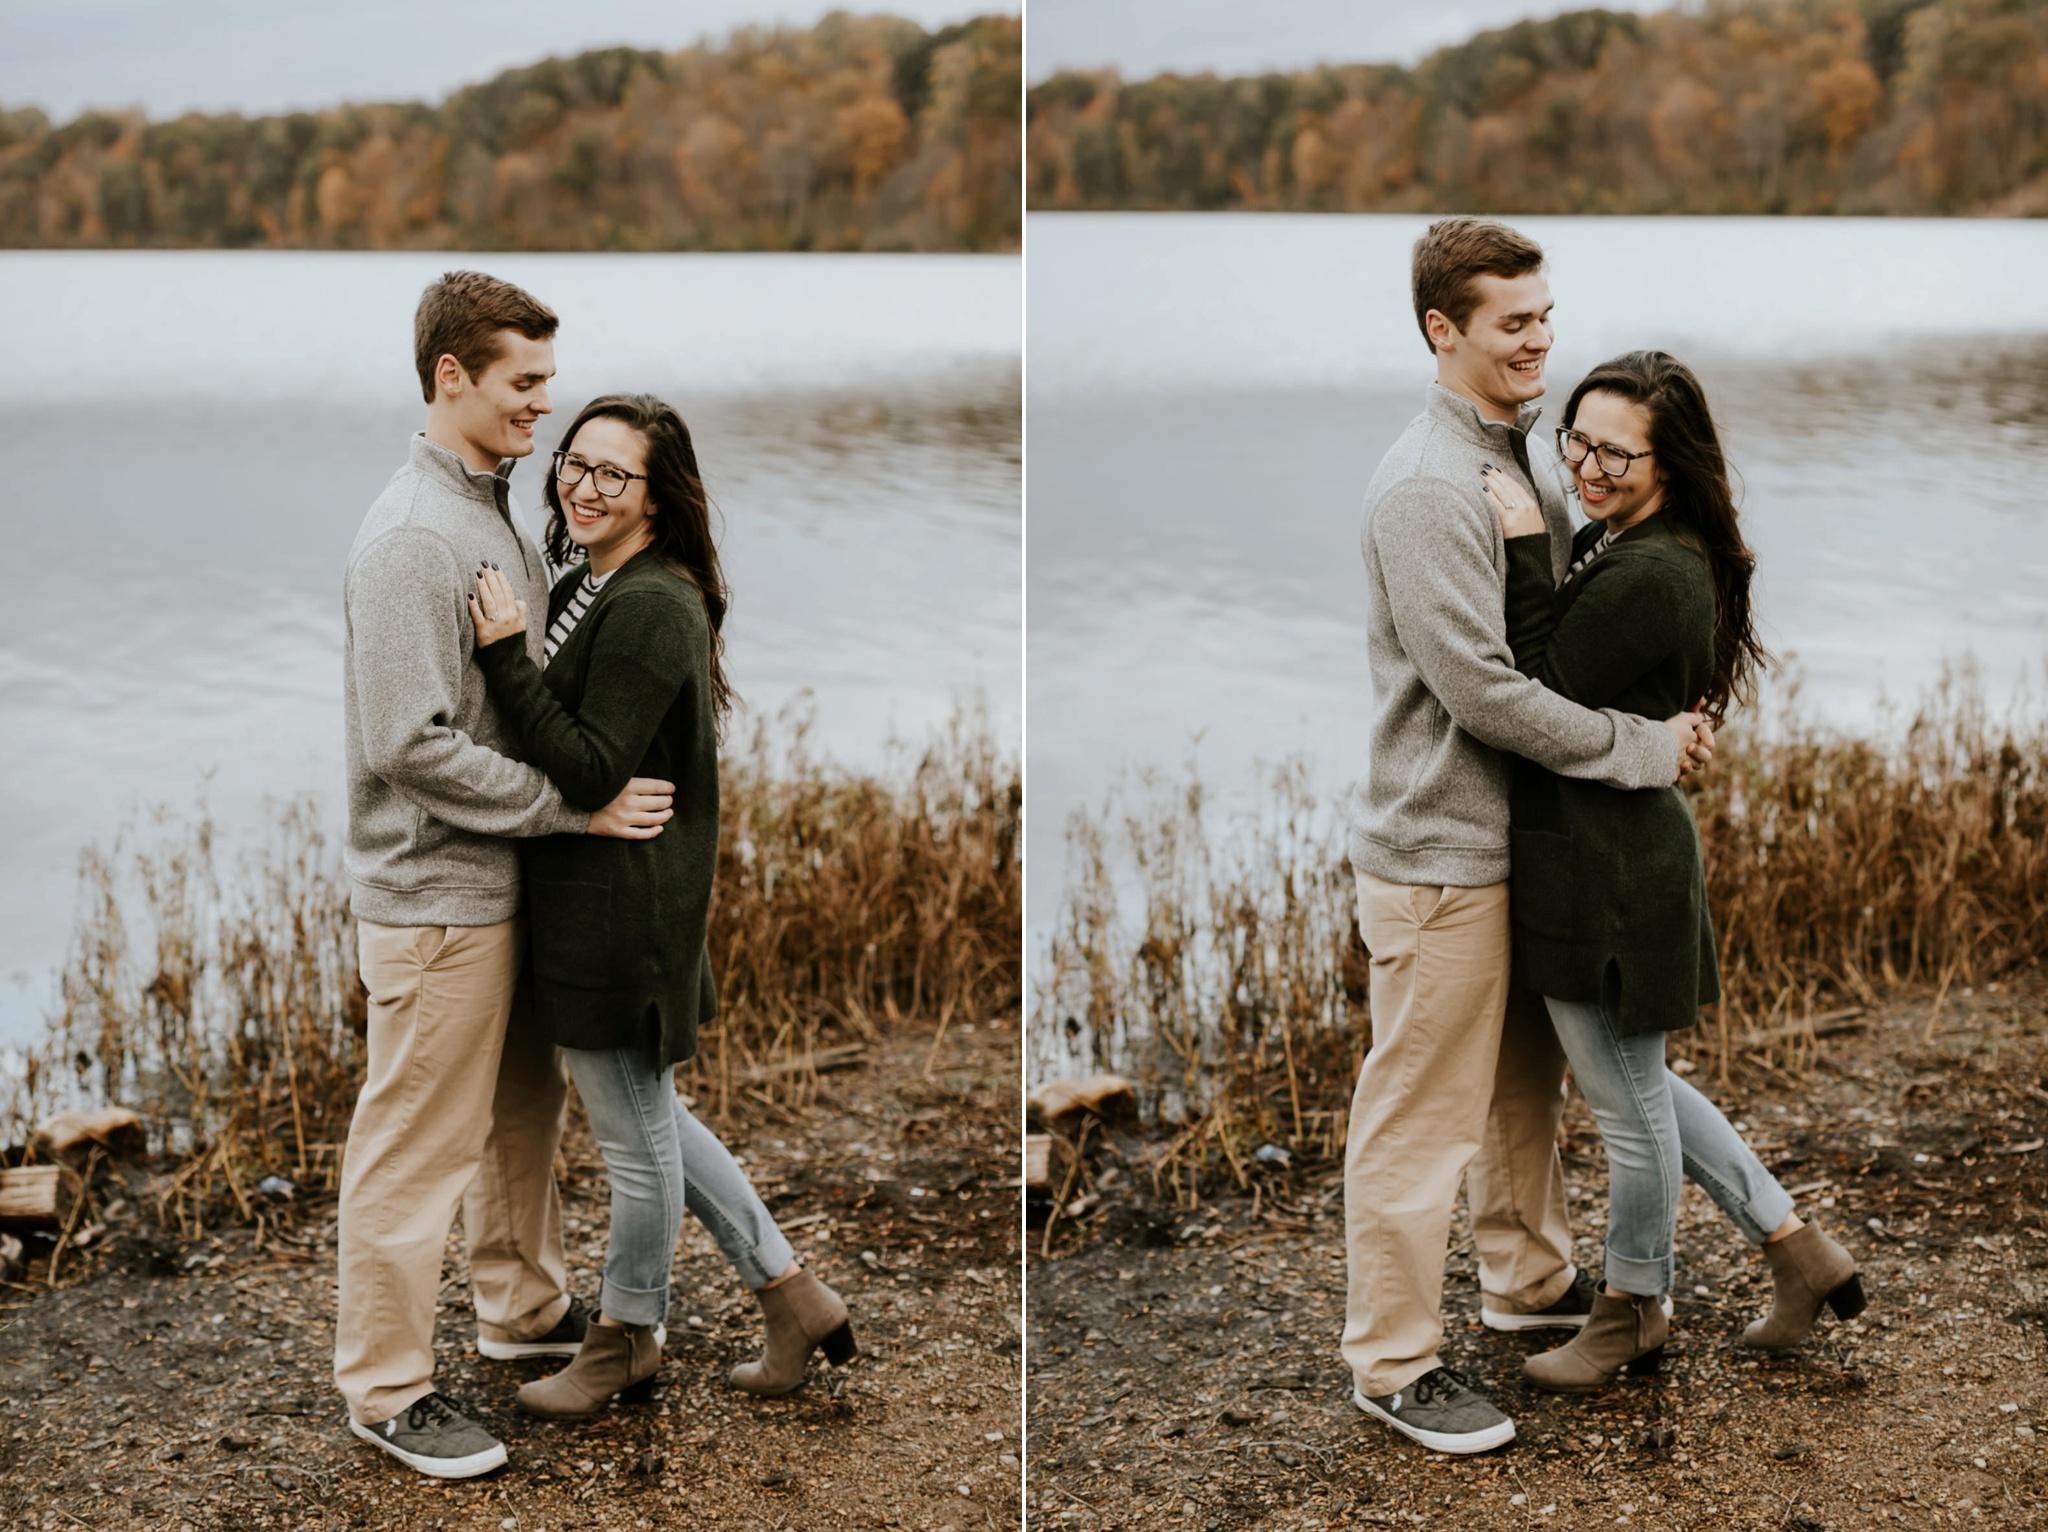 17-10-30 Lauren and Joe Engagement Edited-54_WEB.jpg